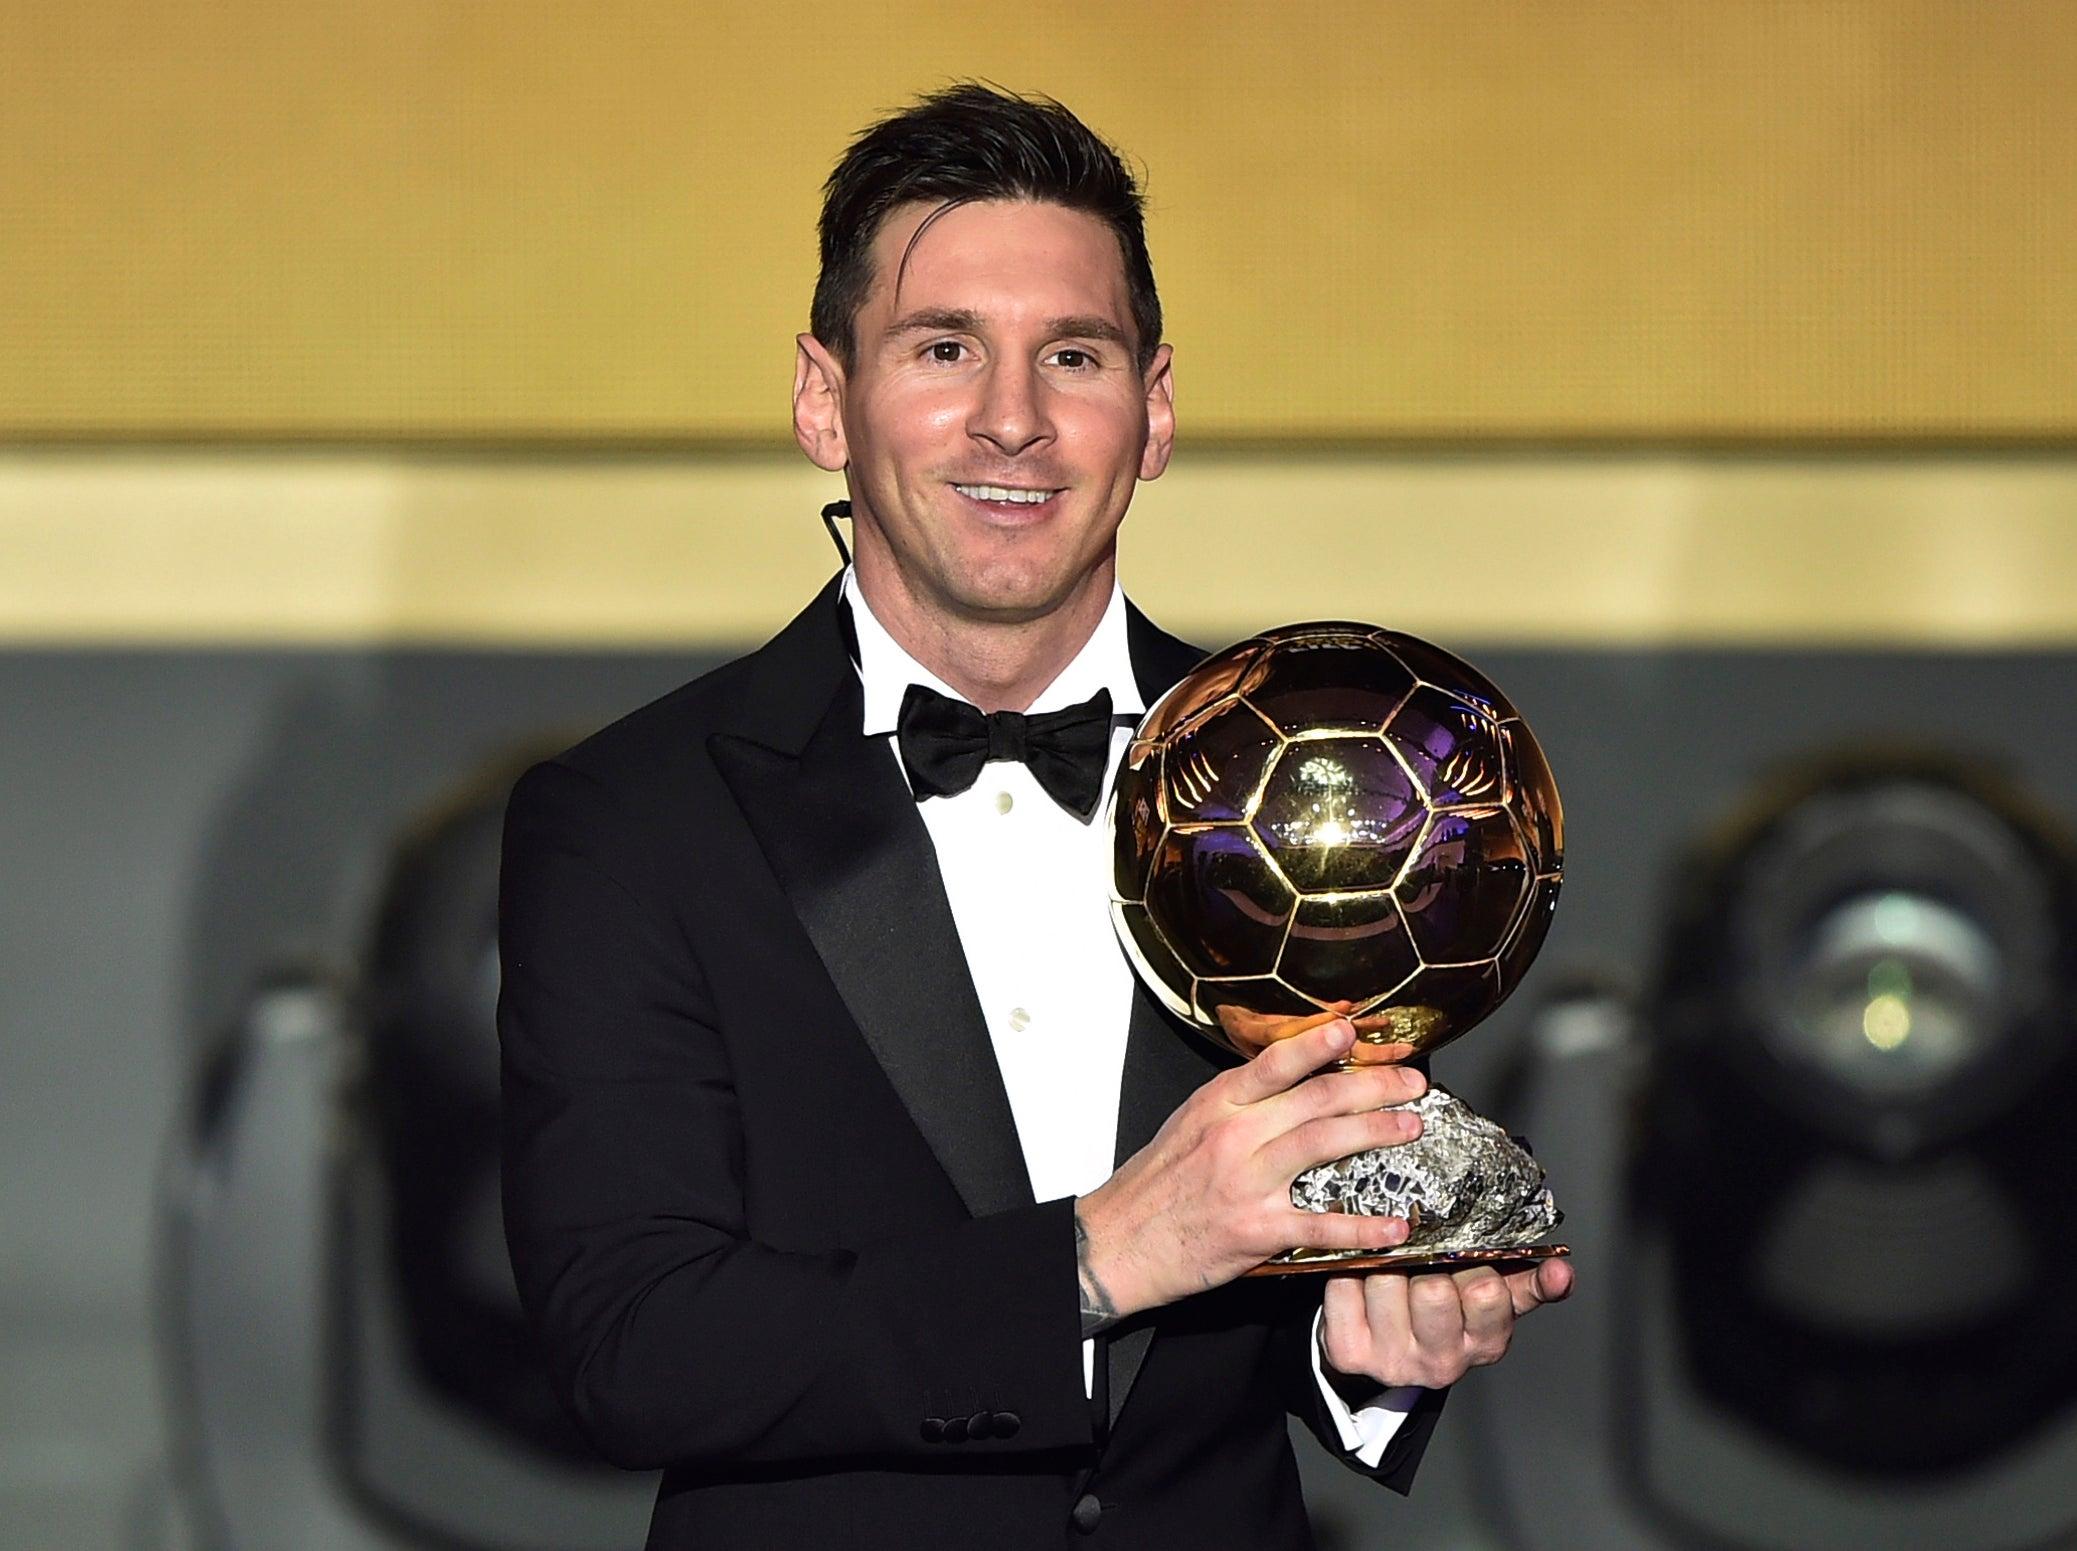 Ballon d'Or 2019 winner: How Lionel Messi beat Cristiano Ronaldo and Virgil van Dijk to top prize